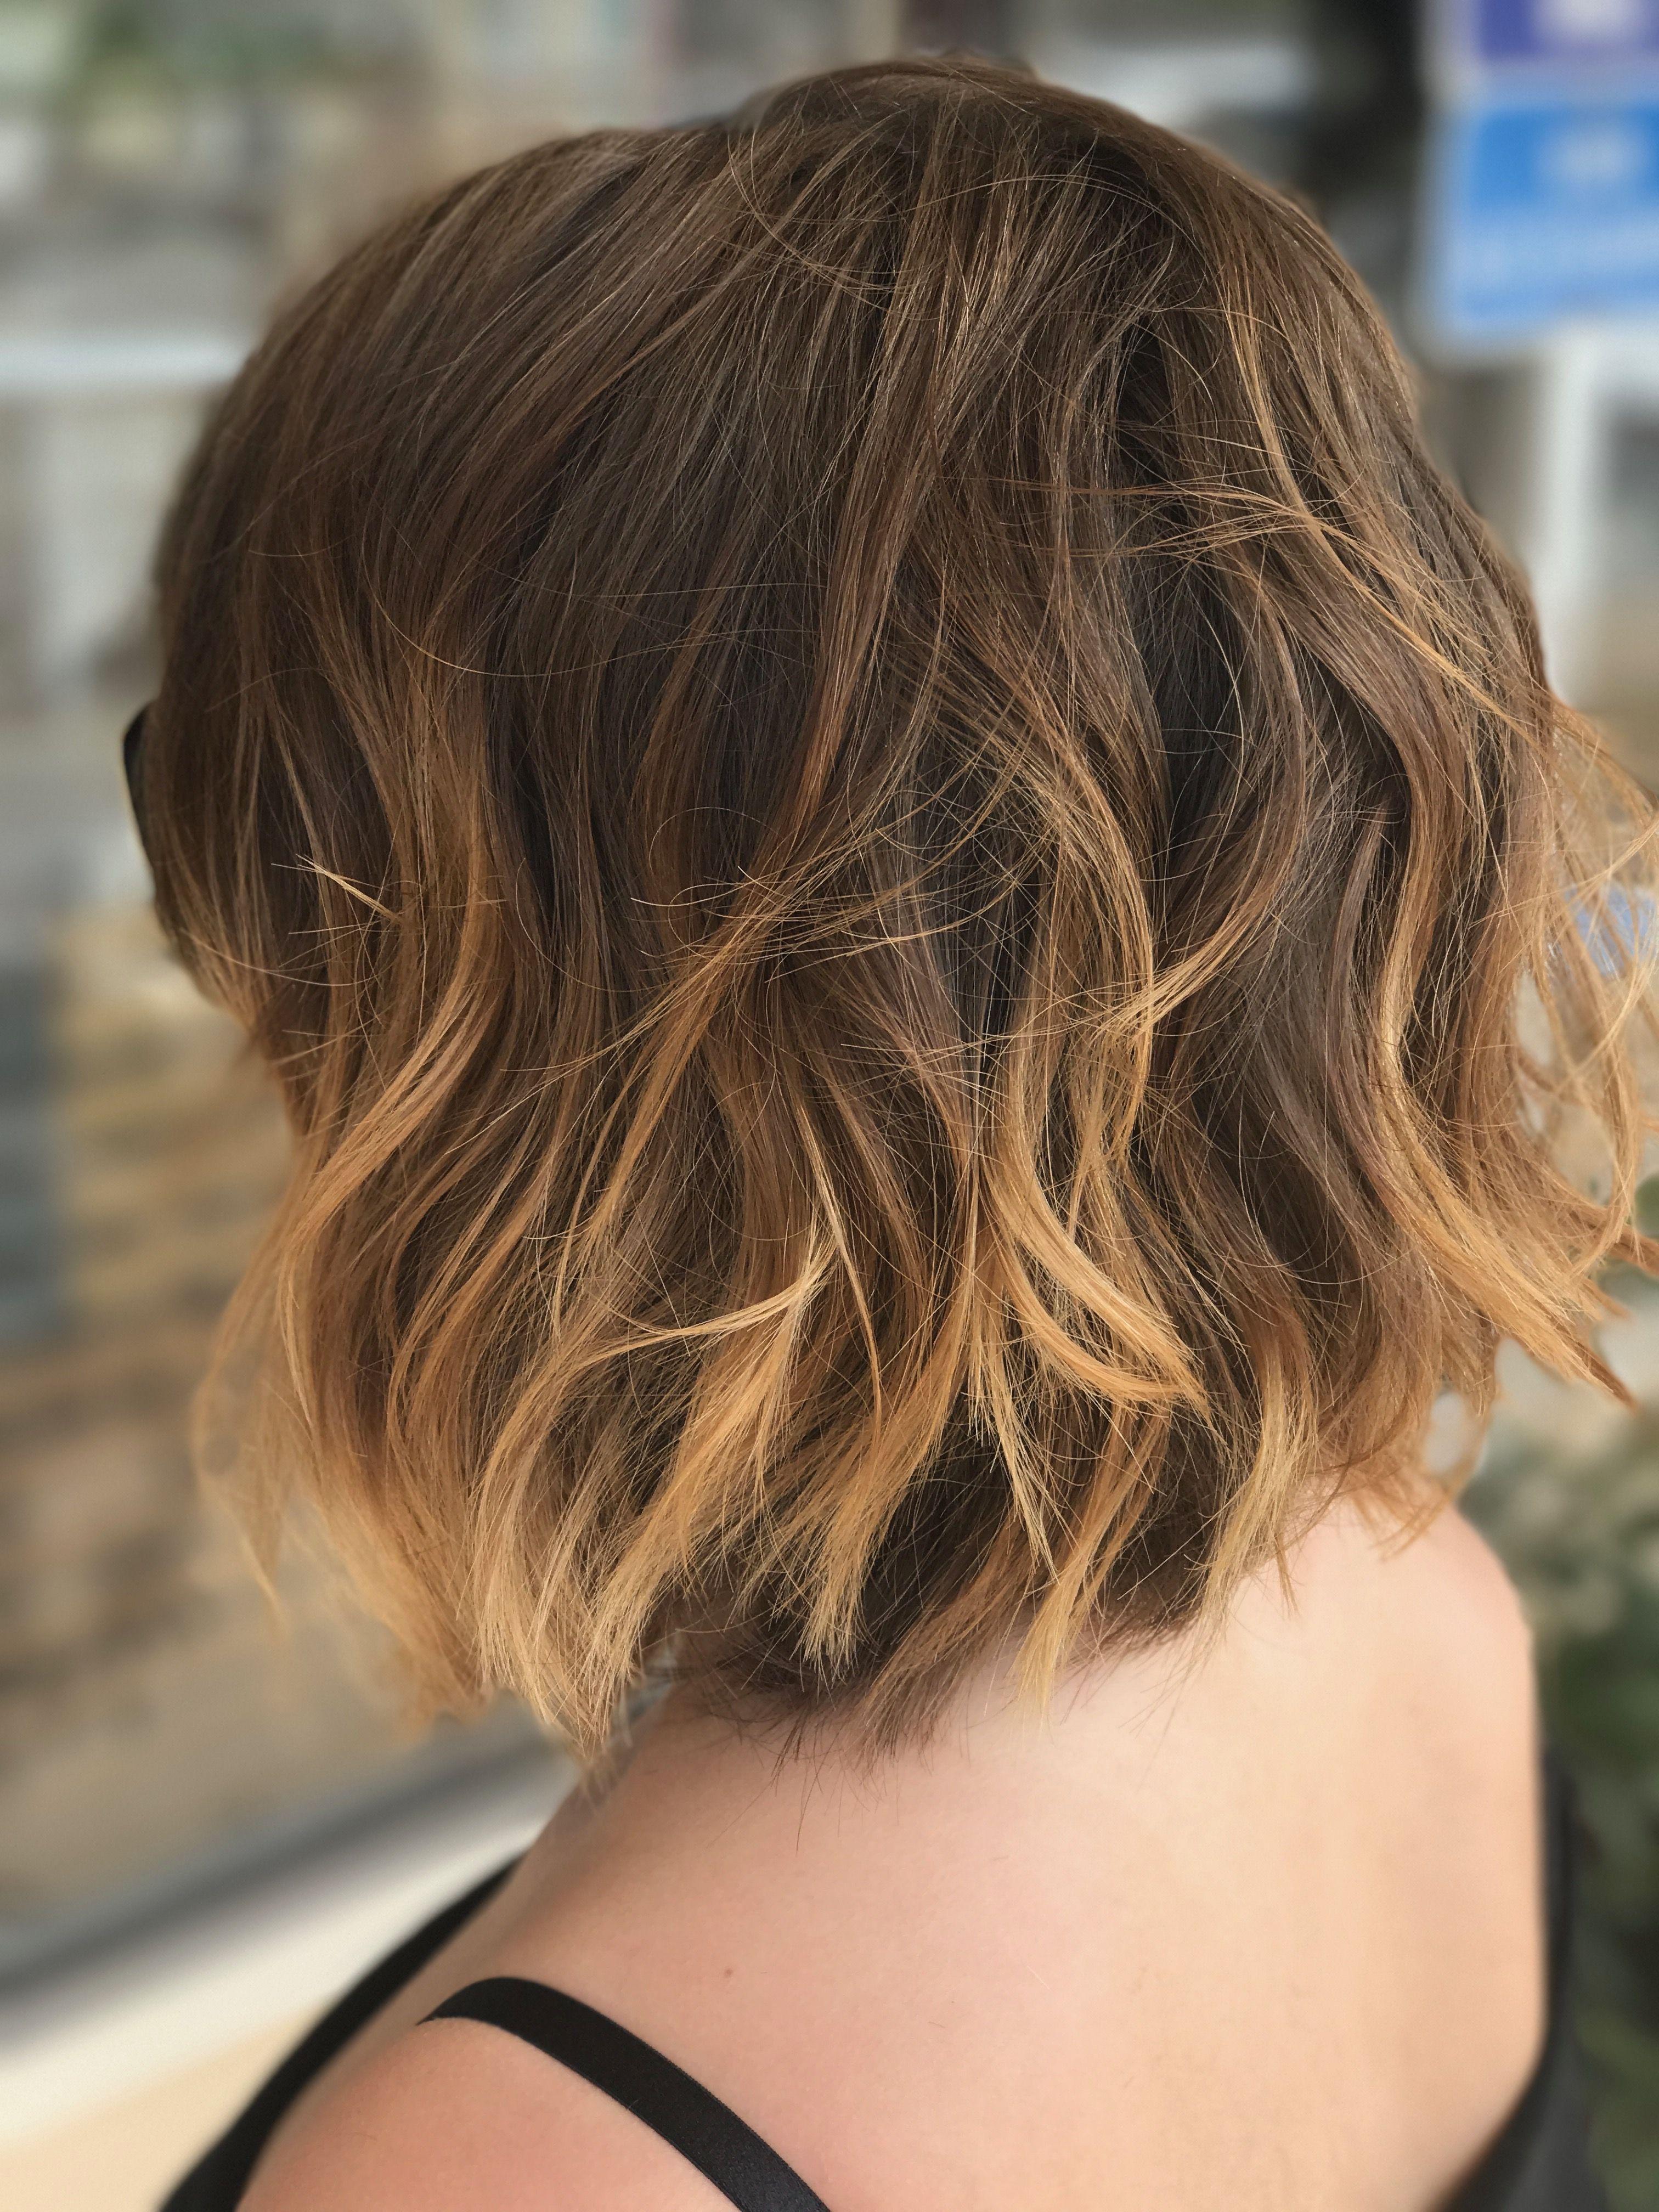 Undone Bob Short Wavy Hair Brown To Blonde Balayage Ombre Hair Color Hair By Kim Wallace Hea Brown To Blonde Balayage Short Wavy Hair Blonde Ombre Balayage